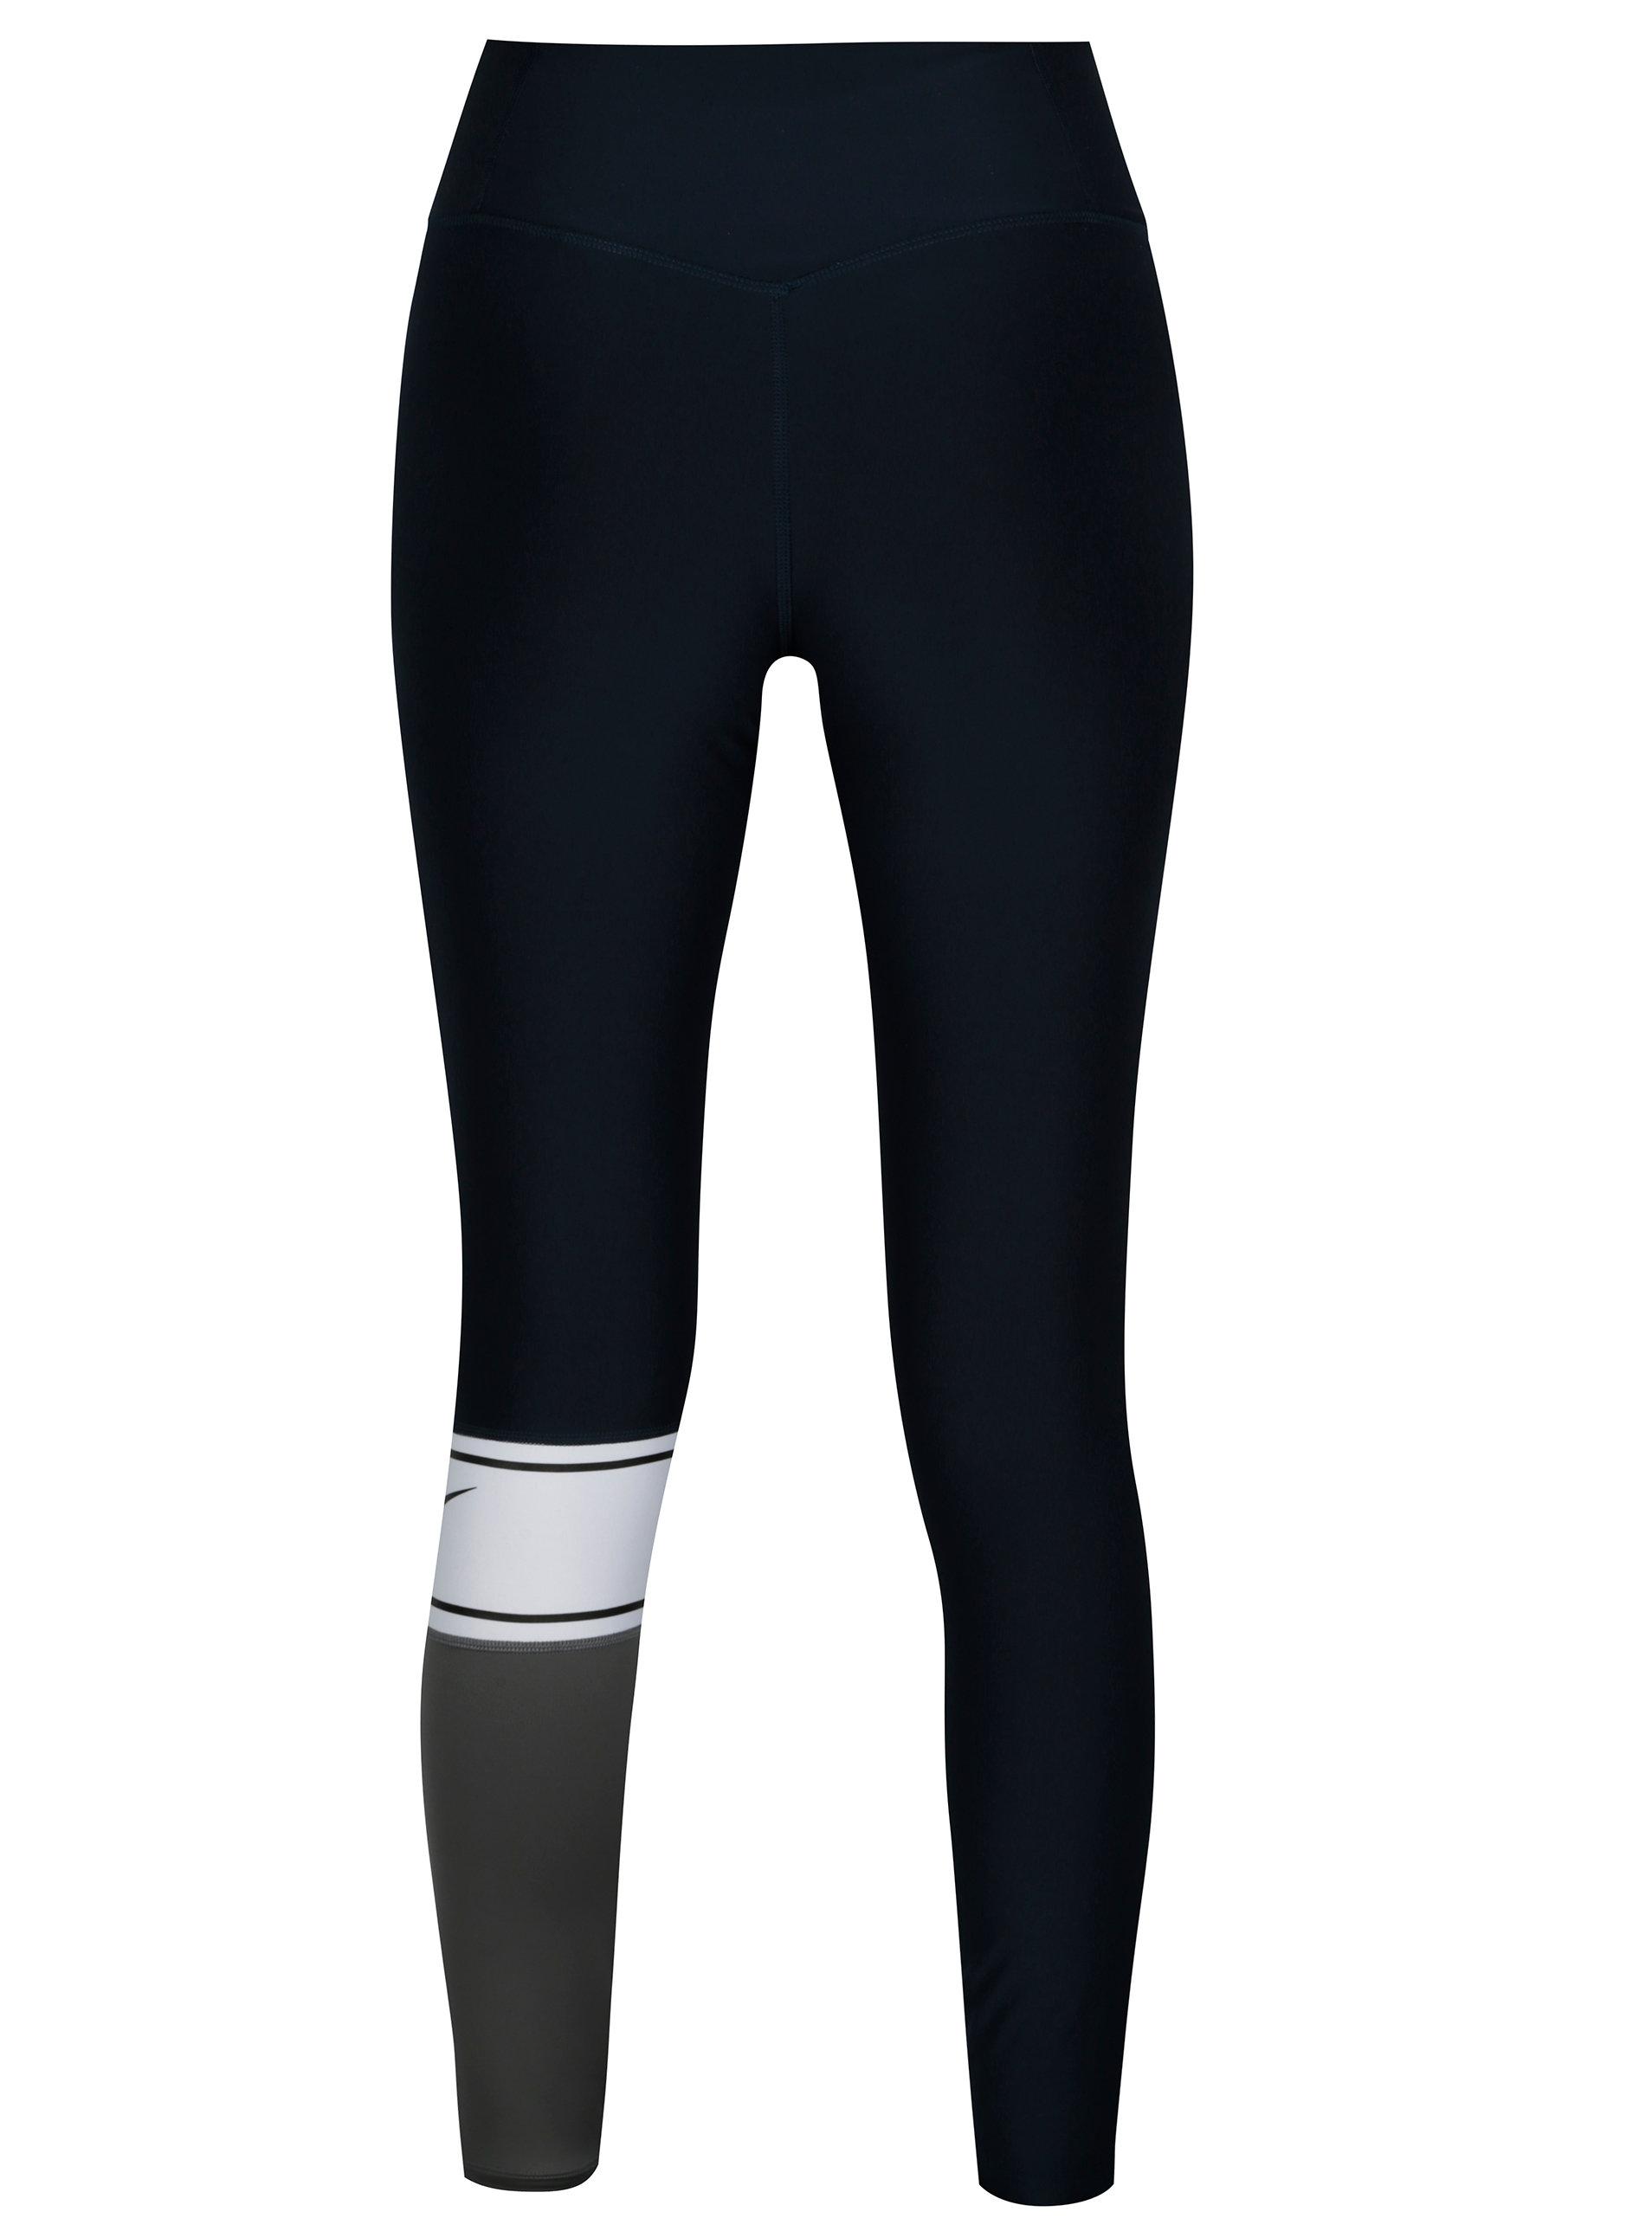 Sivo-modré dámske funkčné legíny Nike Power Training Tights ... 6164046530